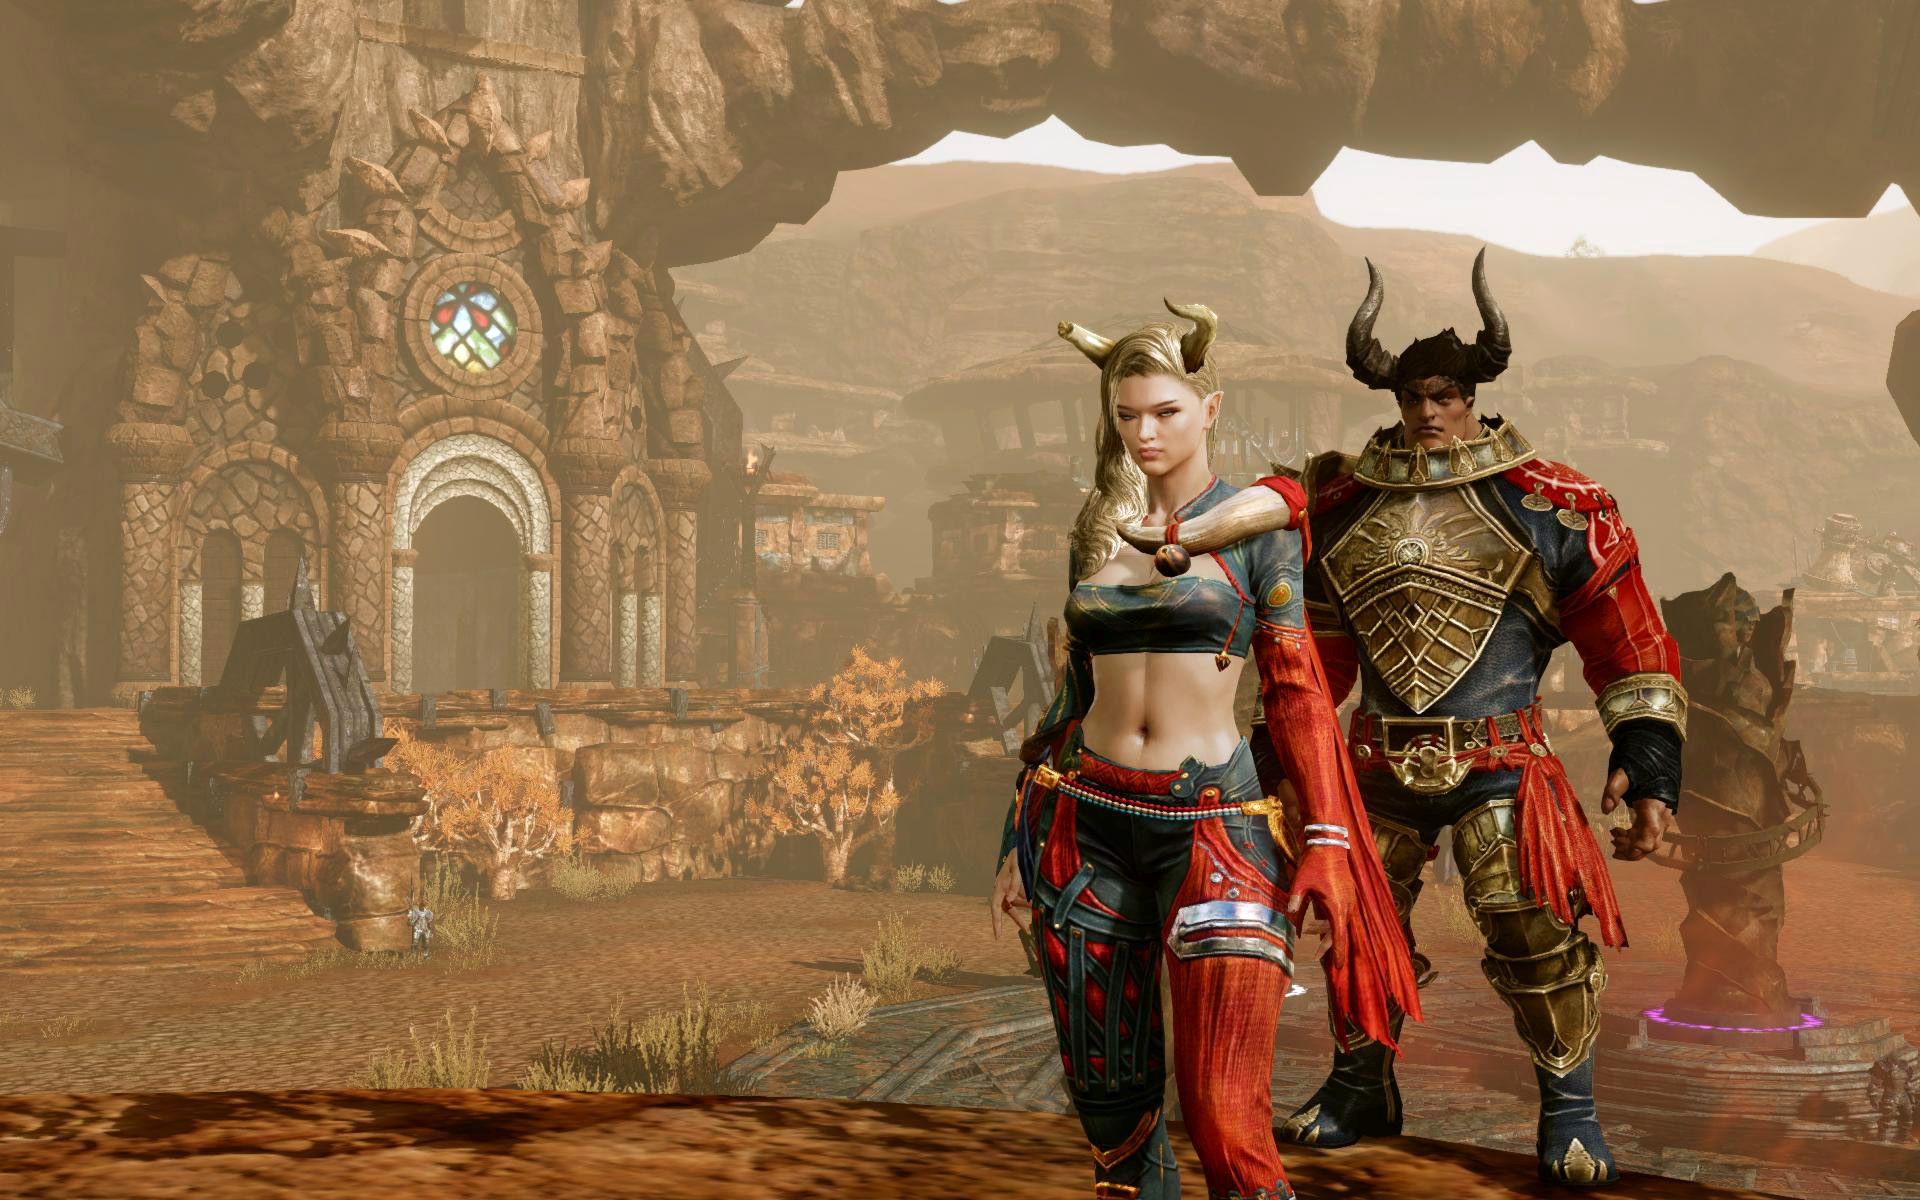 Arche Age 3.0: Neuanfang als Kriegsgeborener – Gameplay im Video